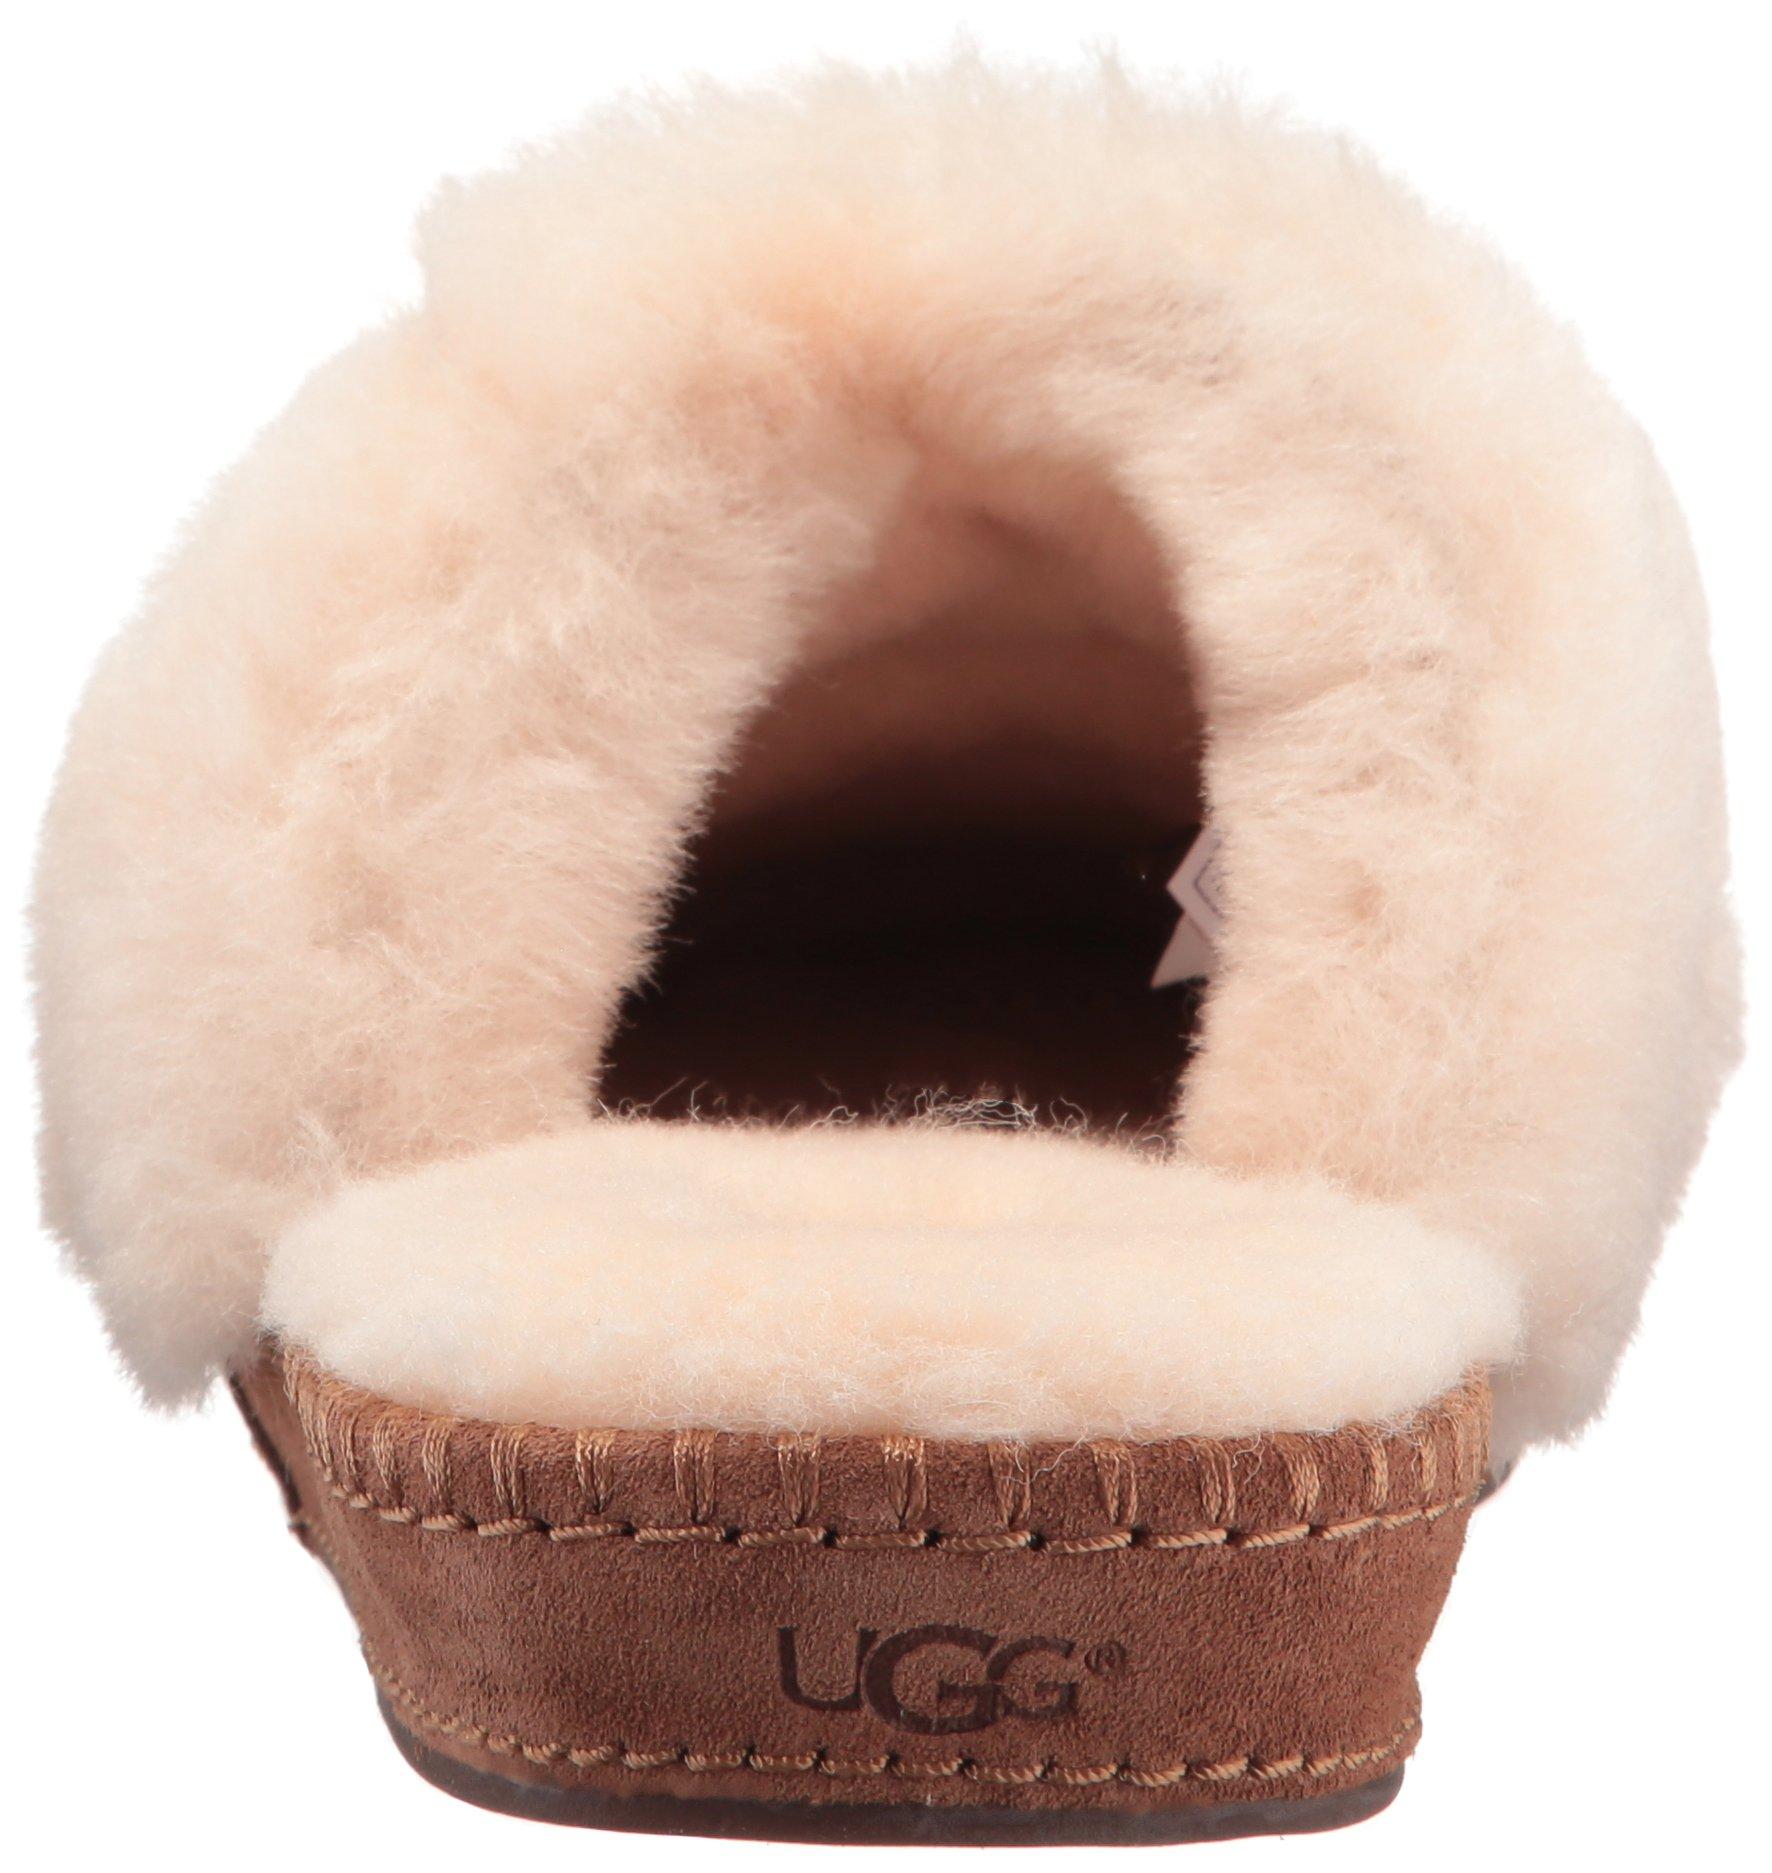 UGG Women's Aira Knit Slip on Slipper,Cream,12 M US by UGG (Image #2)